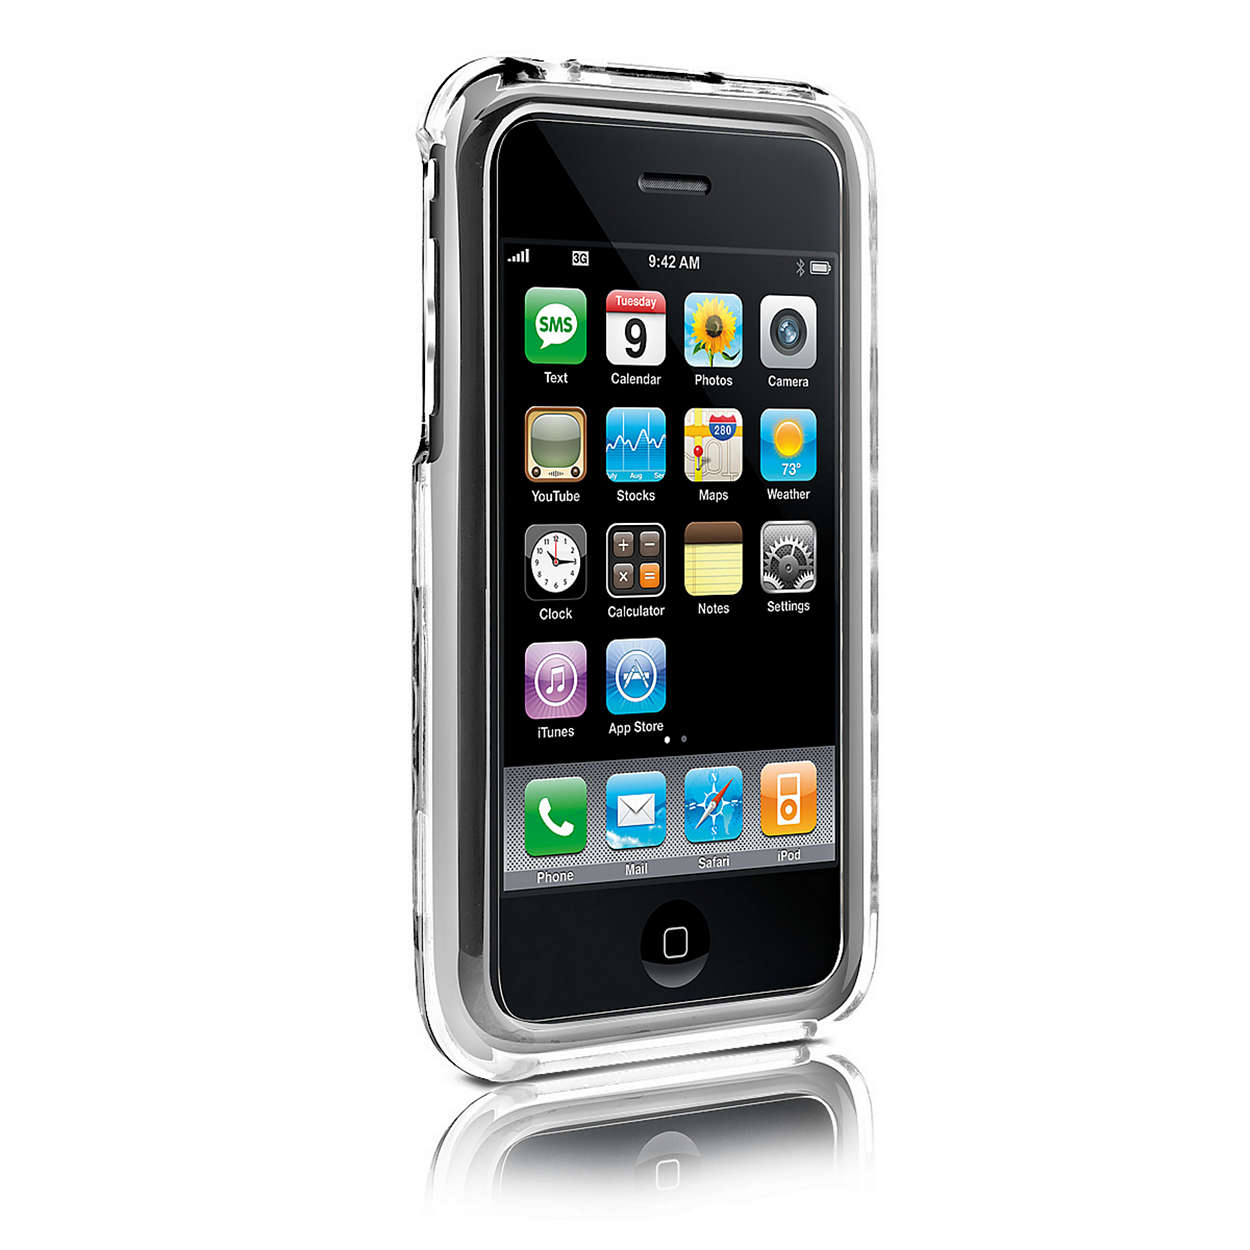 Protege tu iPhone con una funda transparente